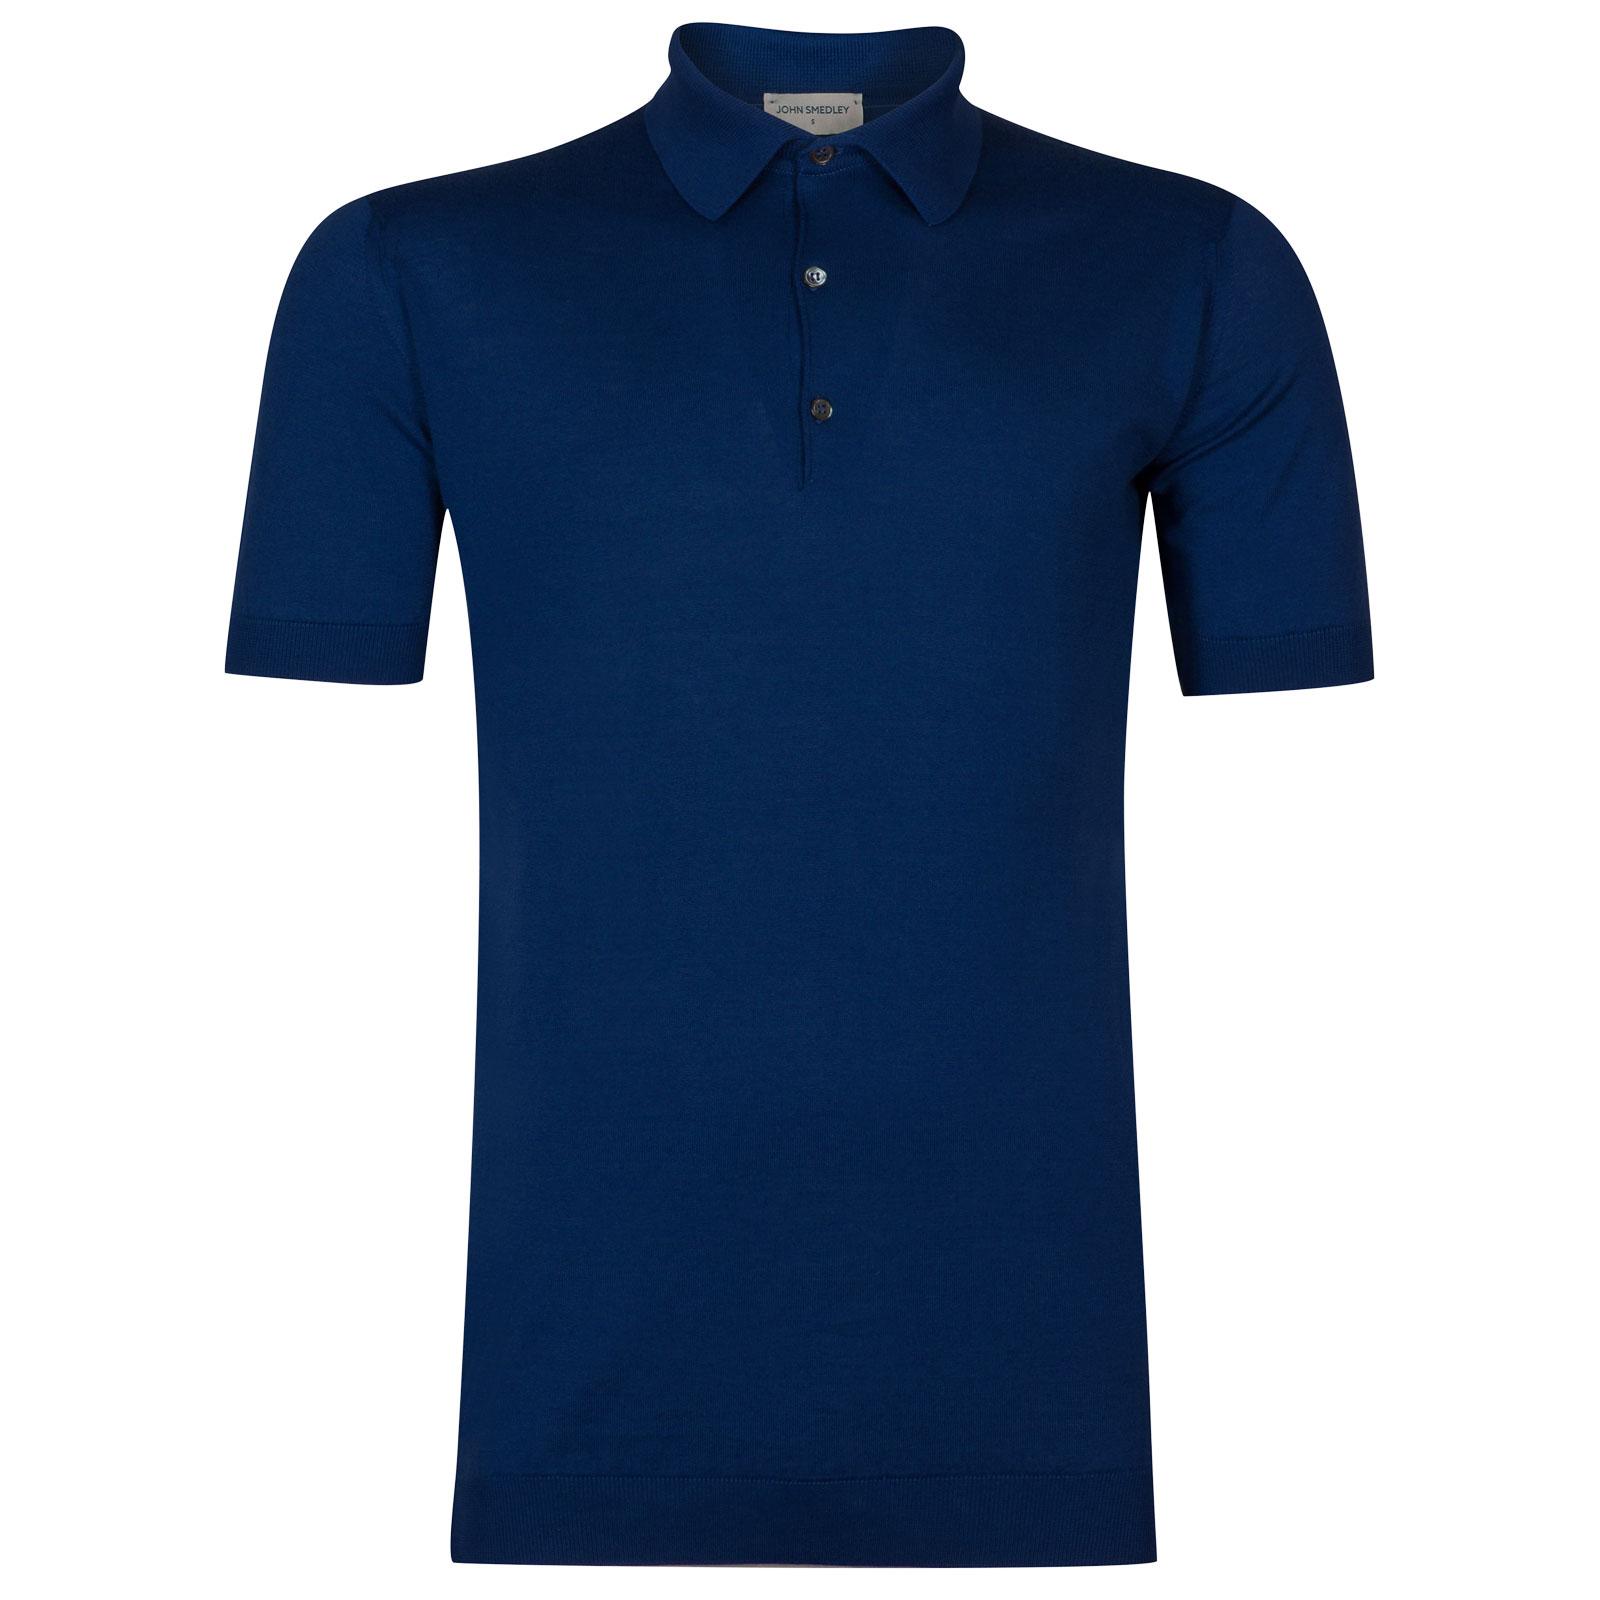 adrian-stevens-blue-Xl